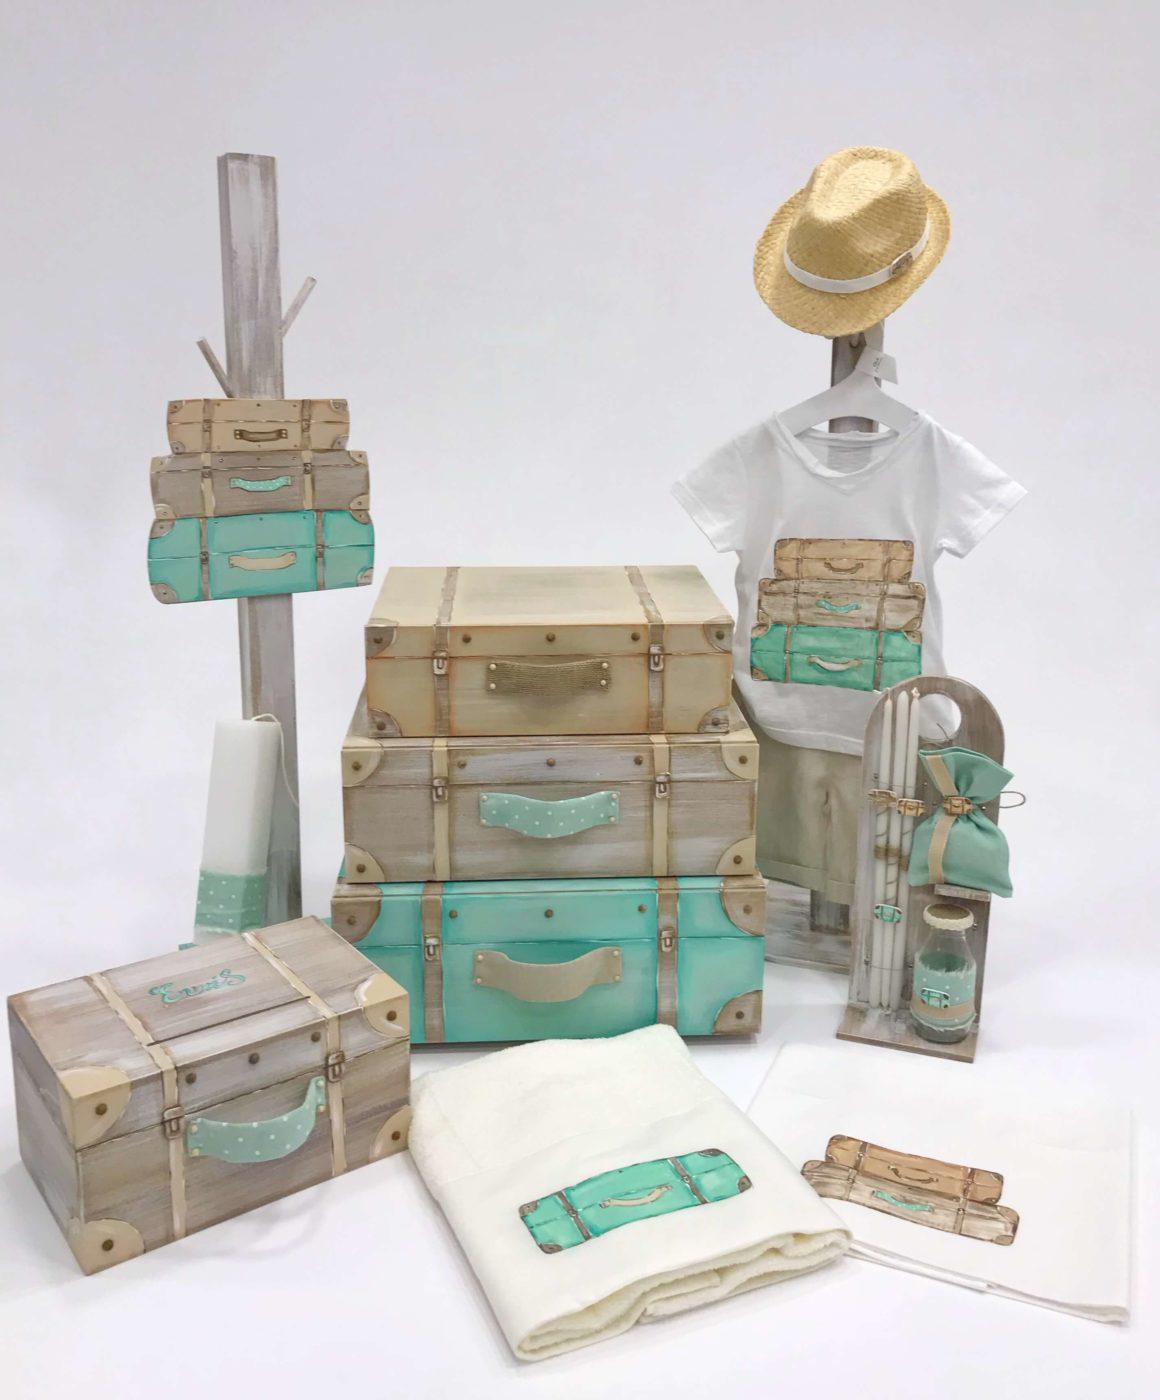 de747b89bc0 Σετ Βάπτισης Travel Suitcases για αγόρι βαπτιστικά αγοράκια κουτιά βαλίτσες  λαμπάδες